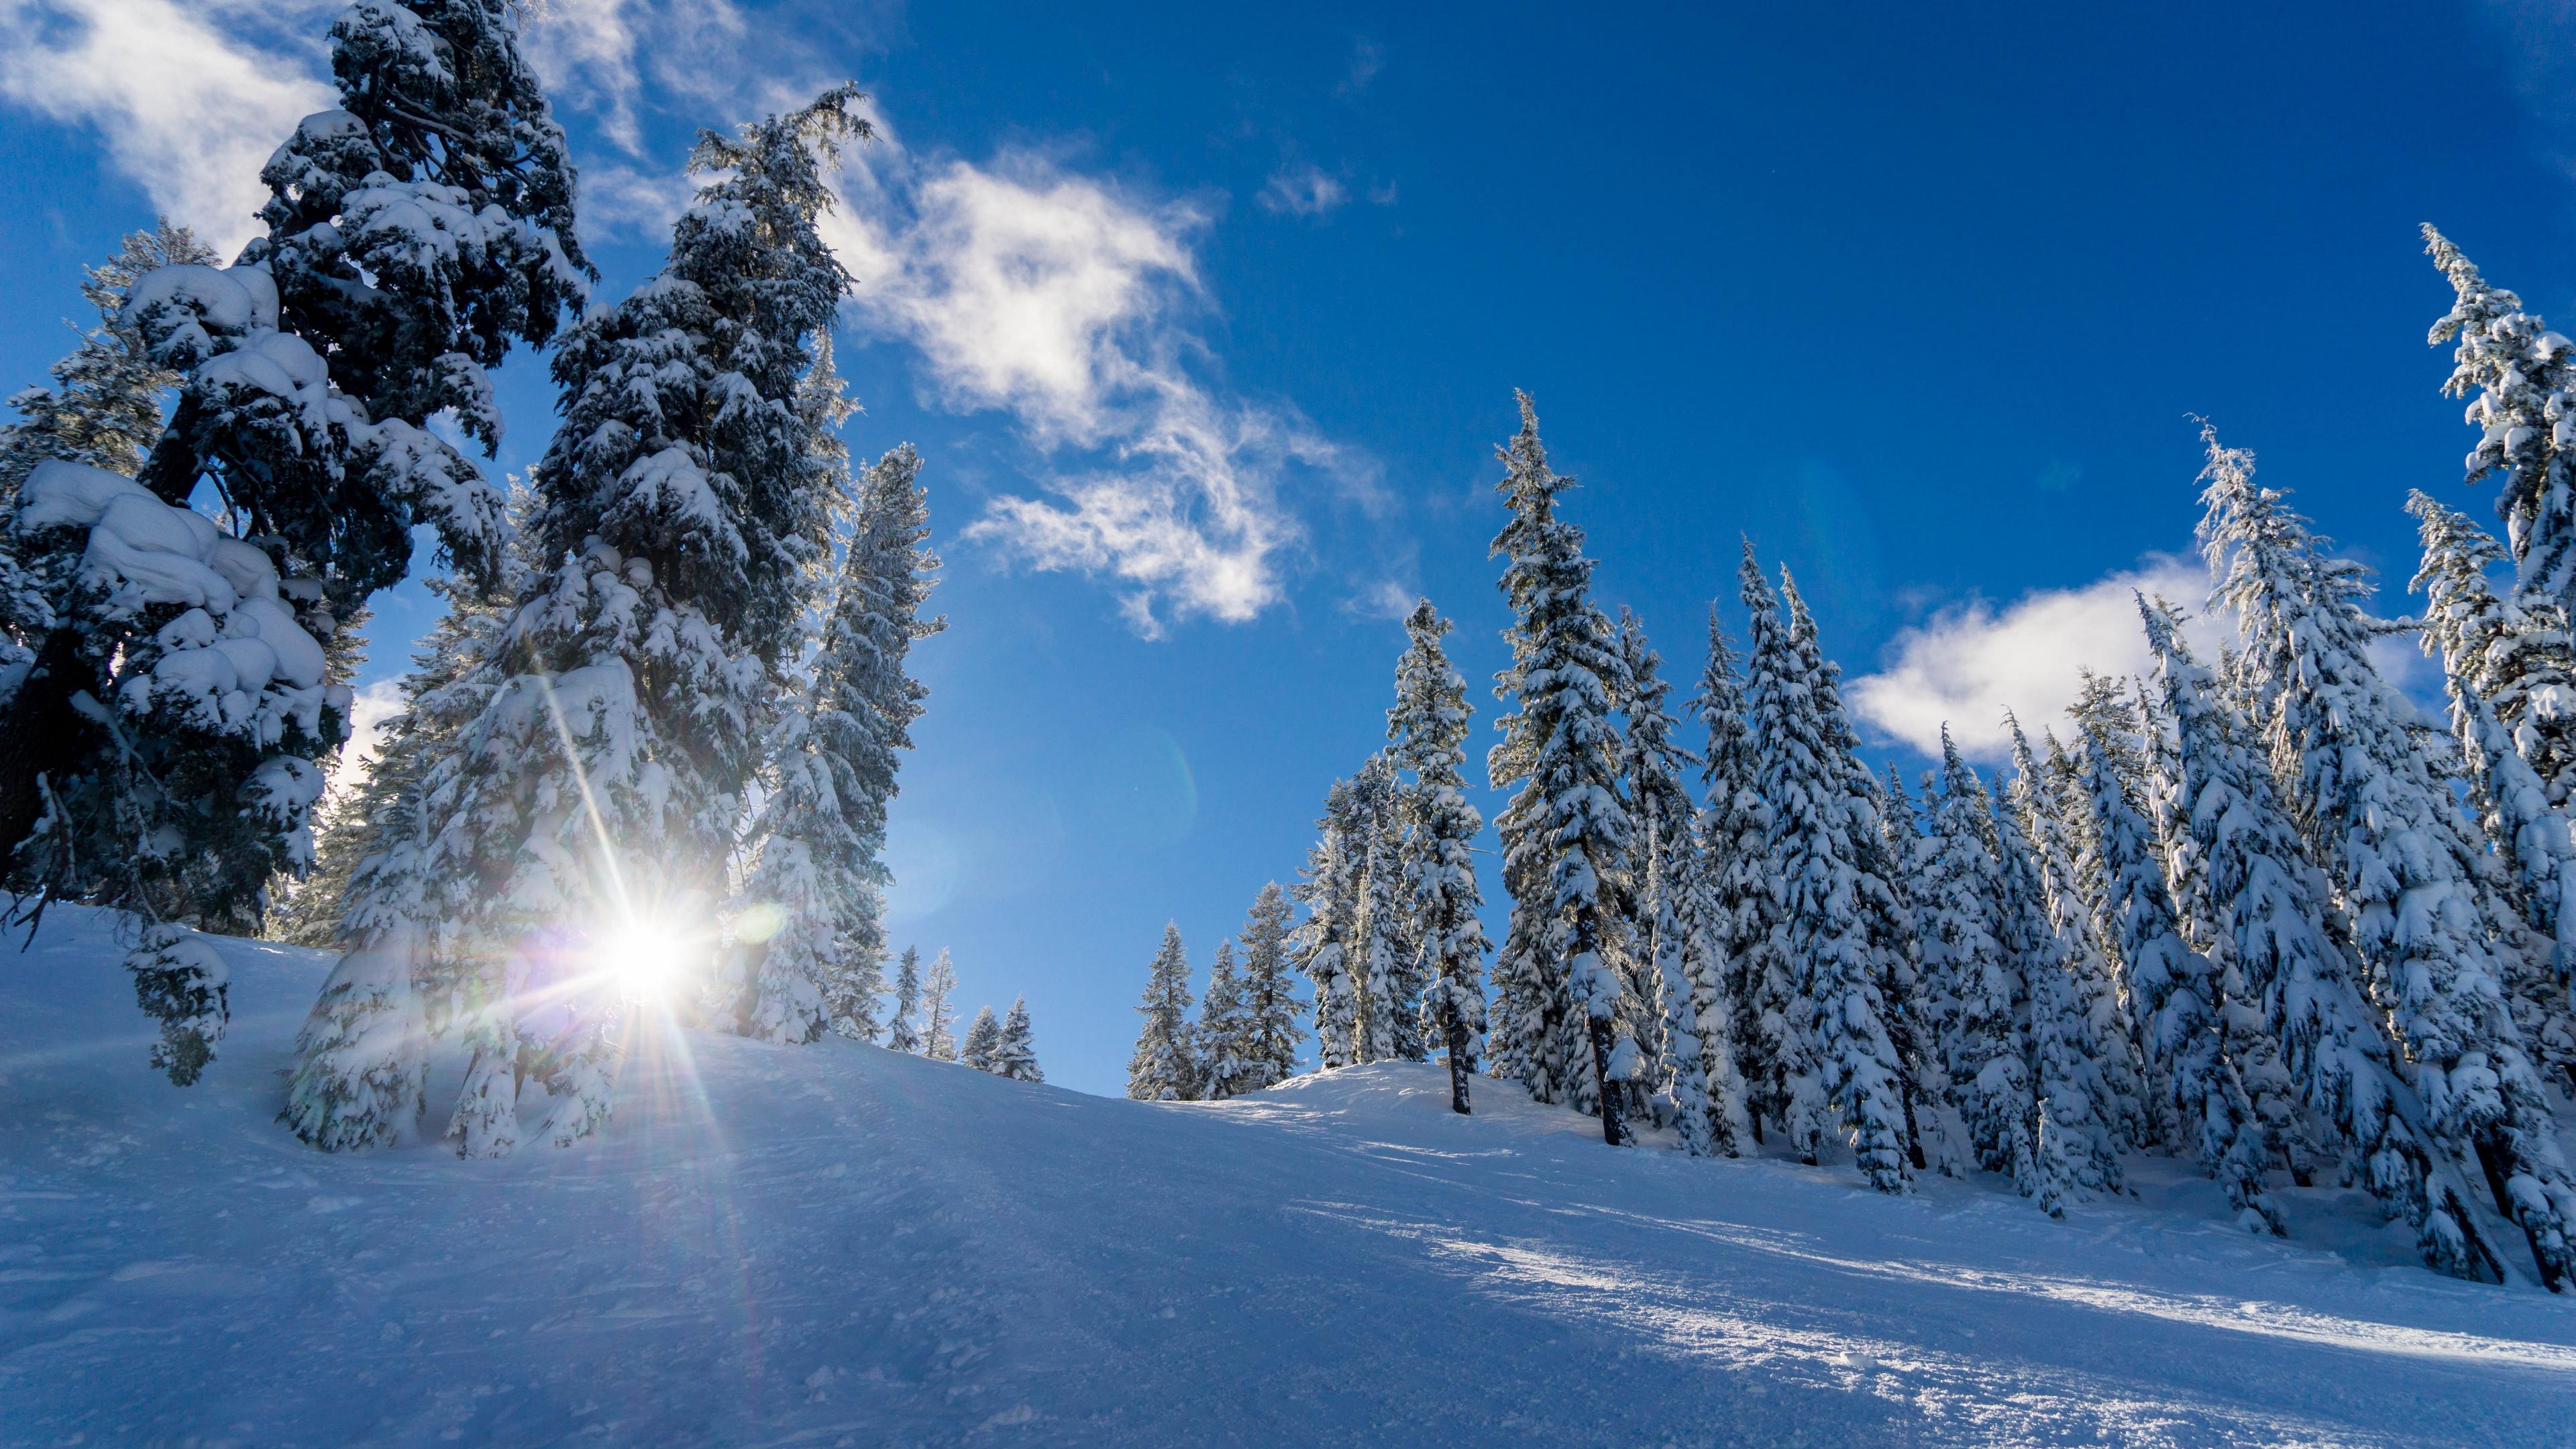 winter snow sunlight trees 4k 1541117797 - winter, snow, sunlight, trees 4k - Winter, Sunlight, Snow